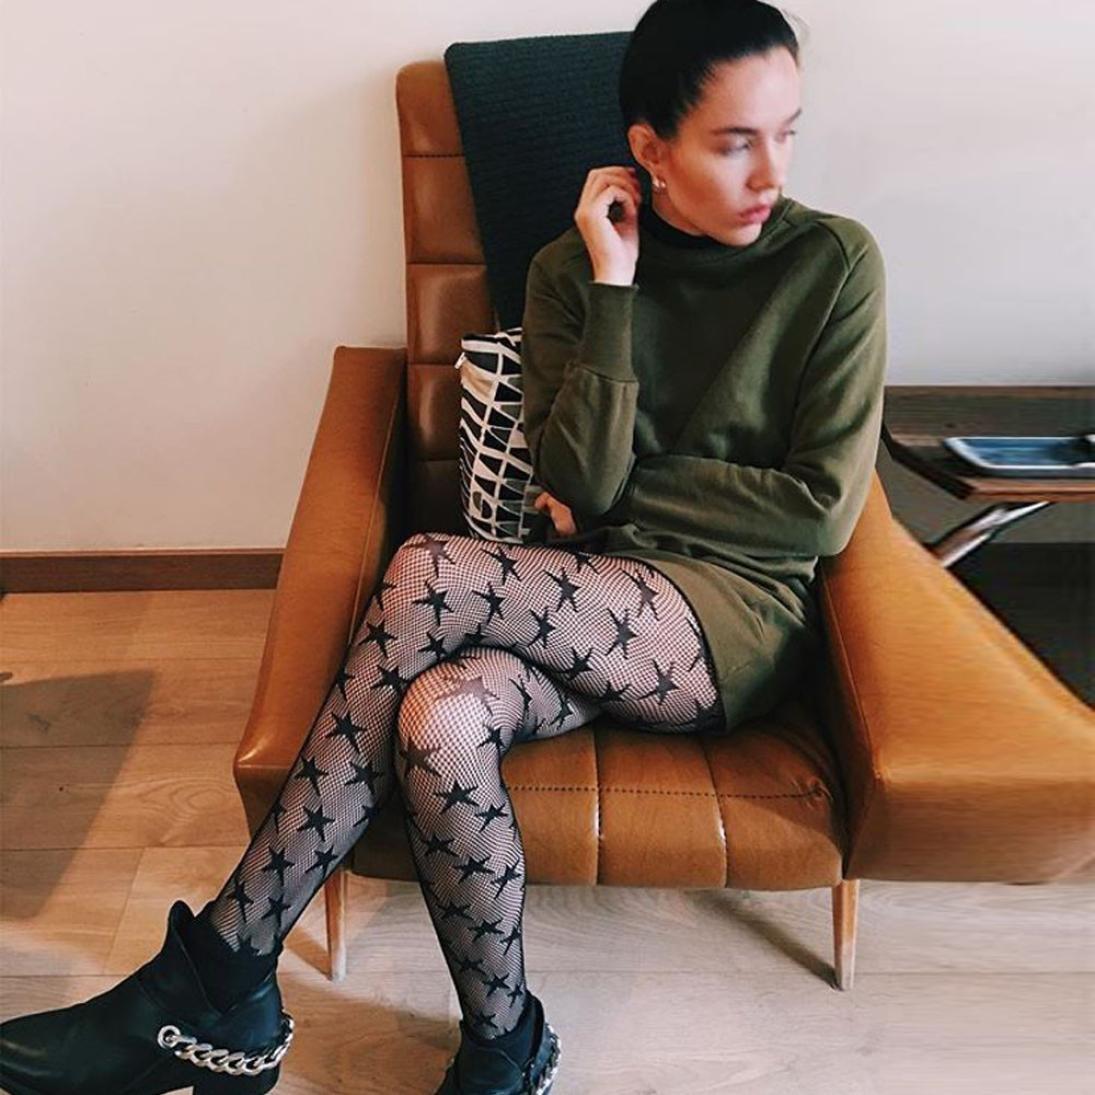 Amazon.com: Dingji Ladys Fishnet Elastic Hosiery, Sexy Black Fishnet Shape High Stockings Pantyhose Tights (A): Clothing